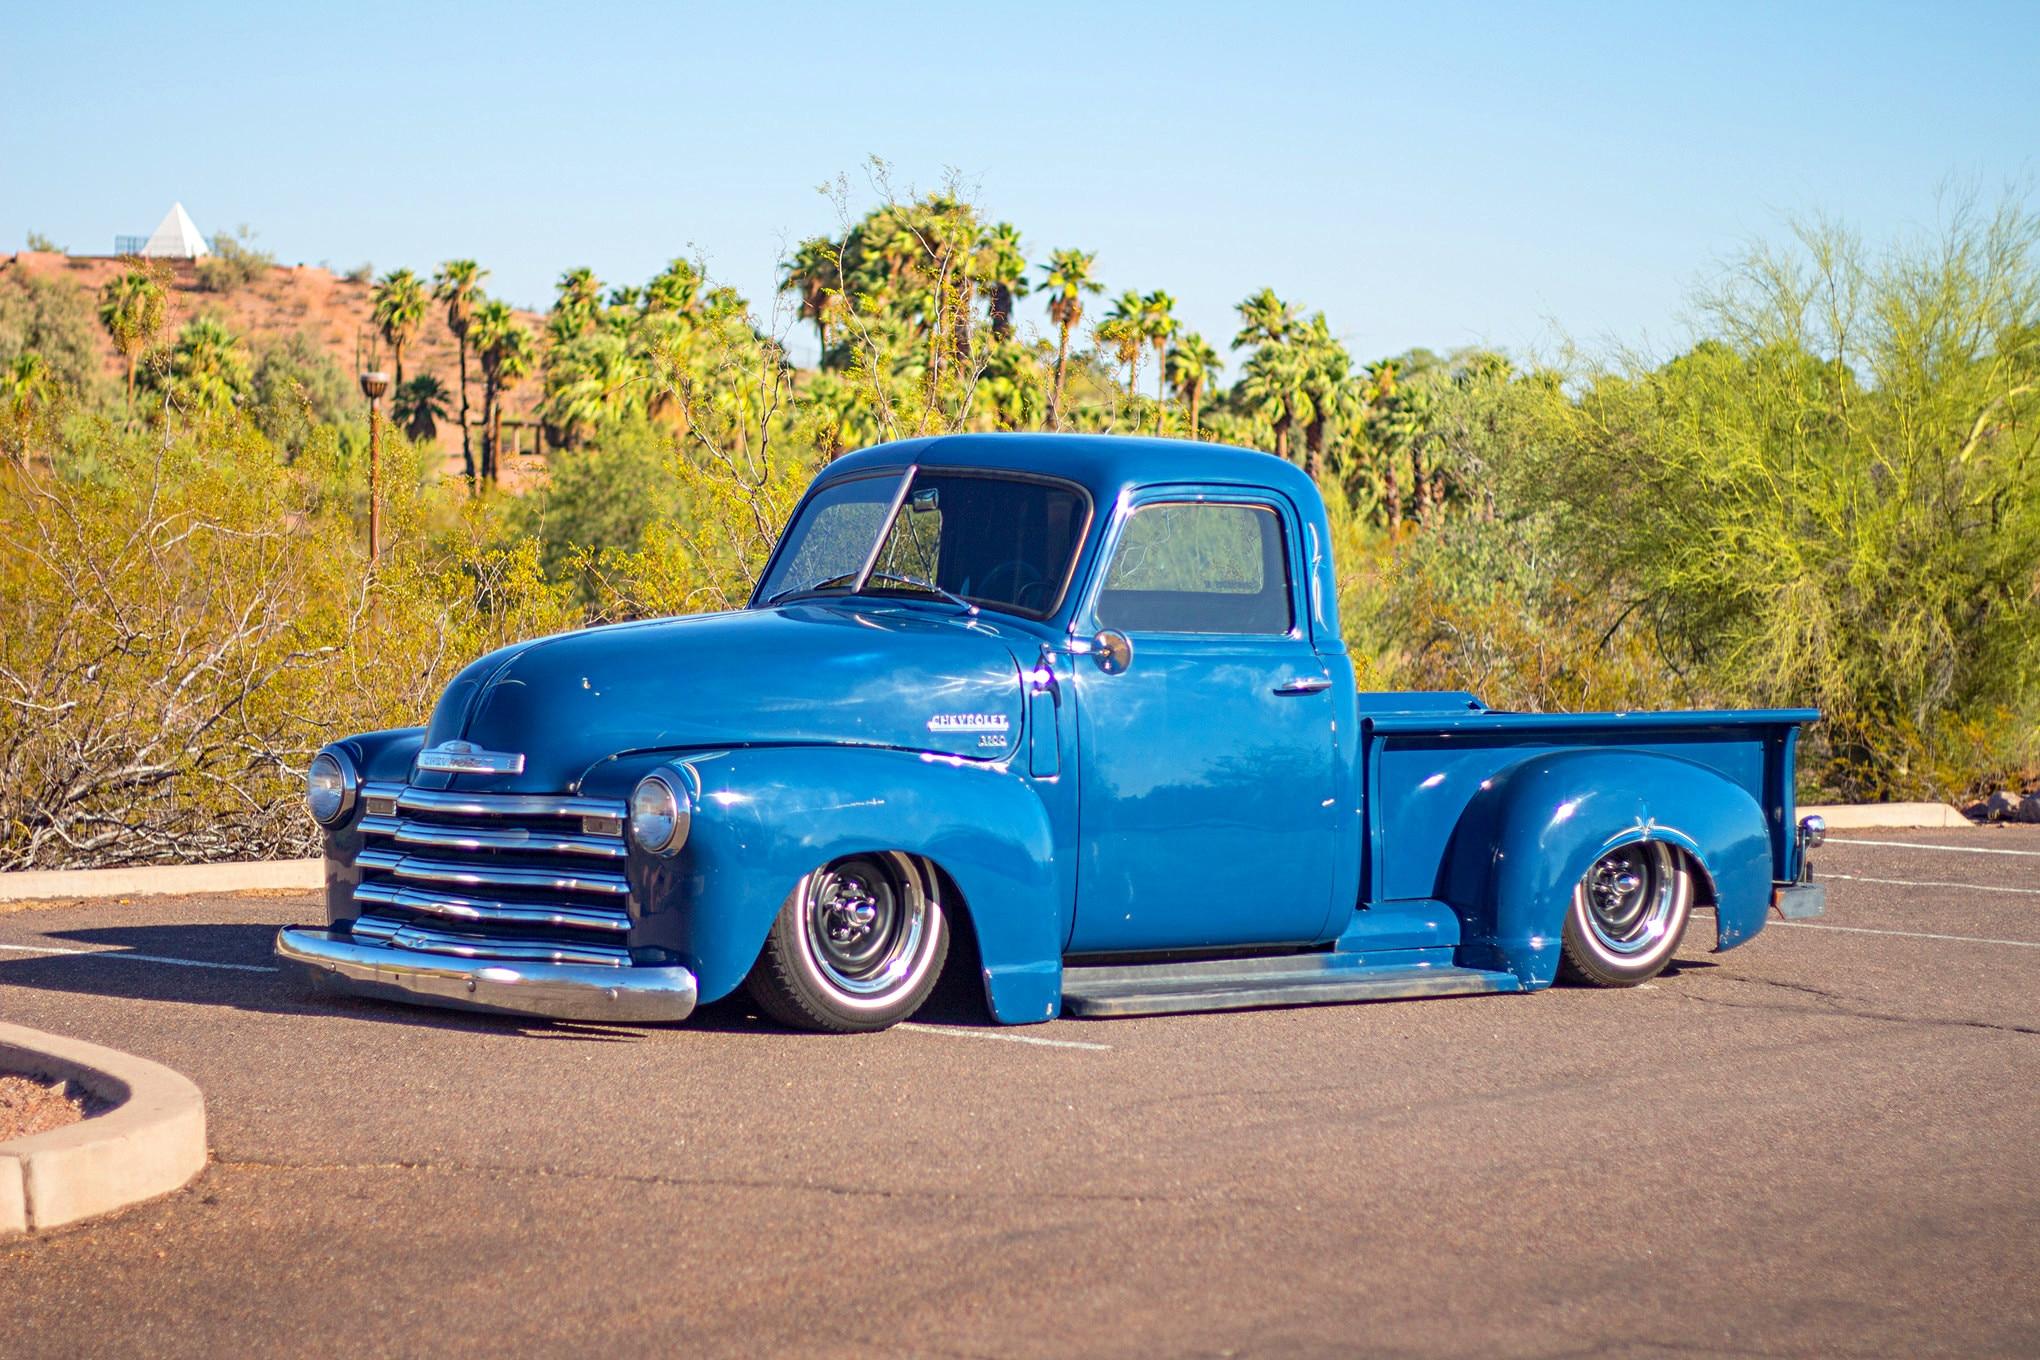 Chevy Truck Wheels >> Chad Fincher's Slammed 1950 Chevy 3100 Truck